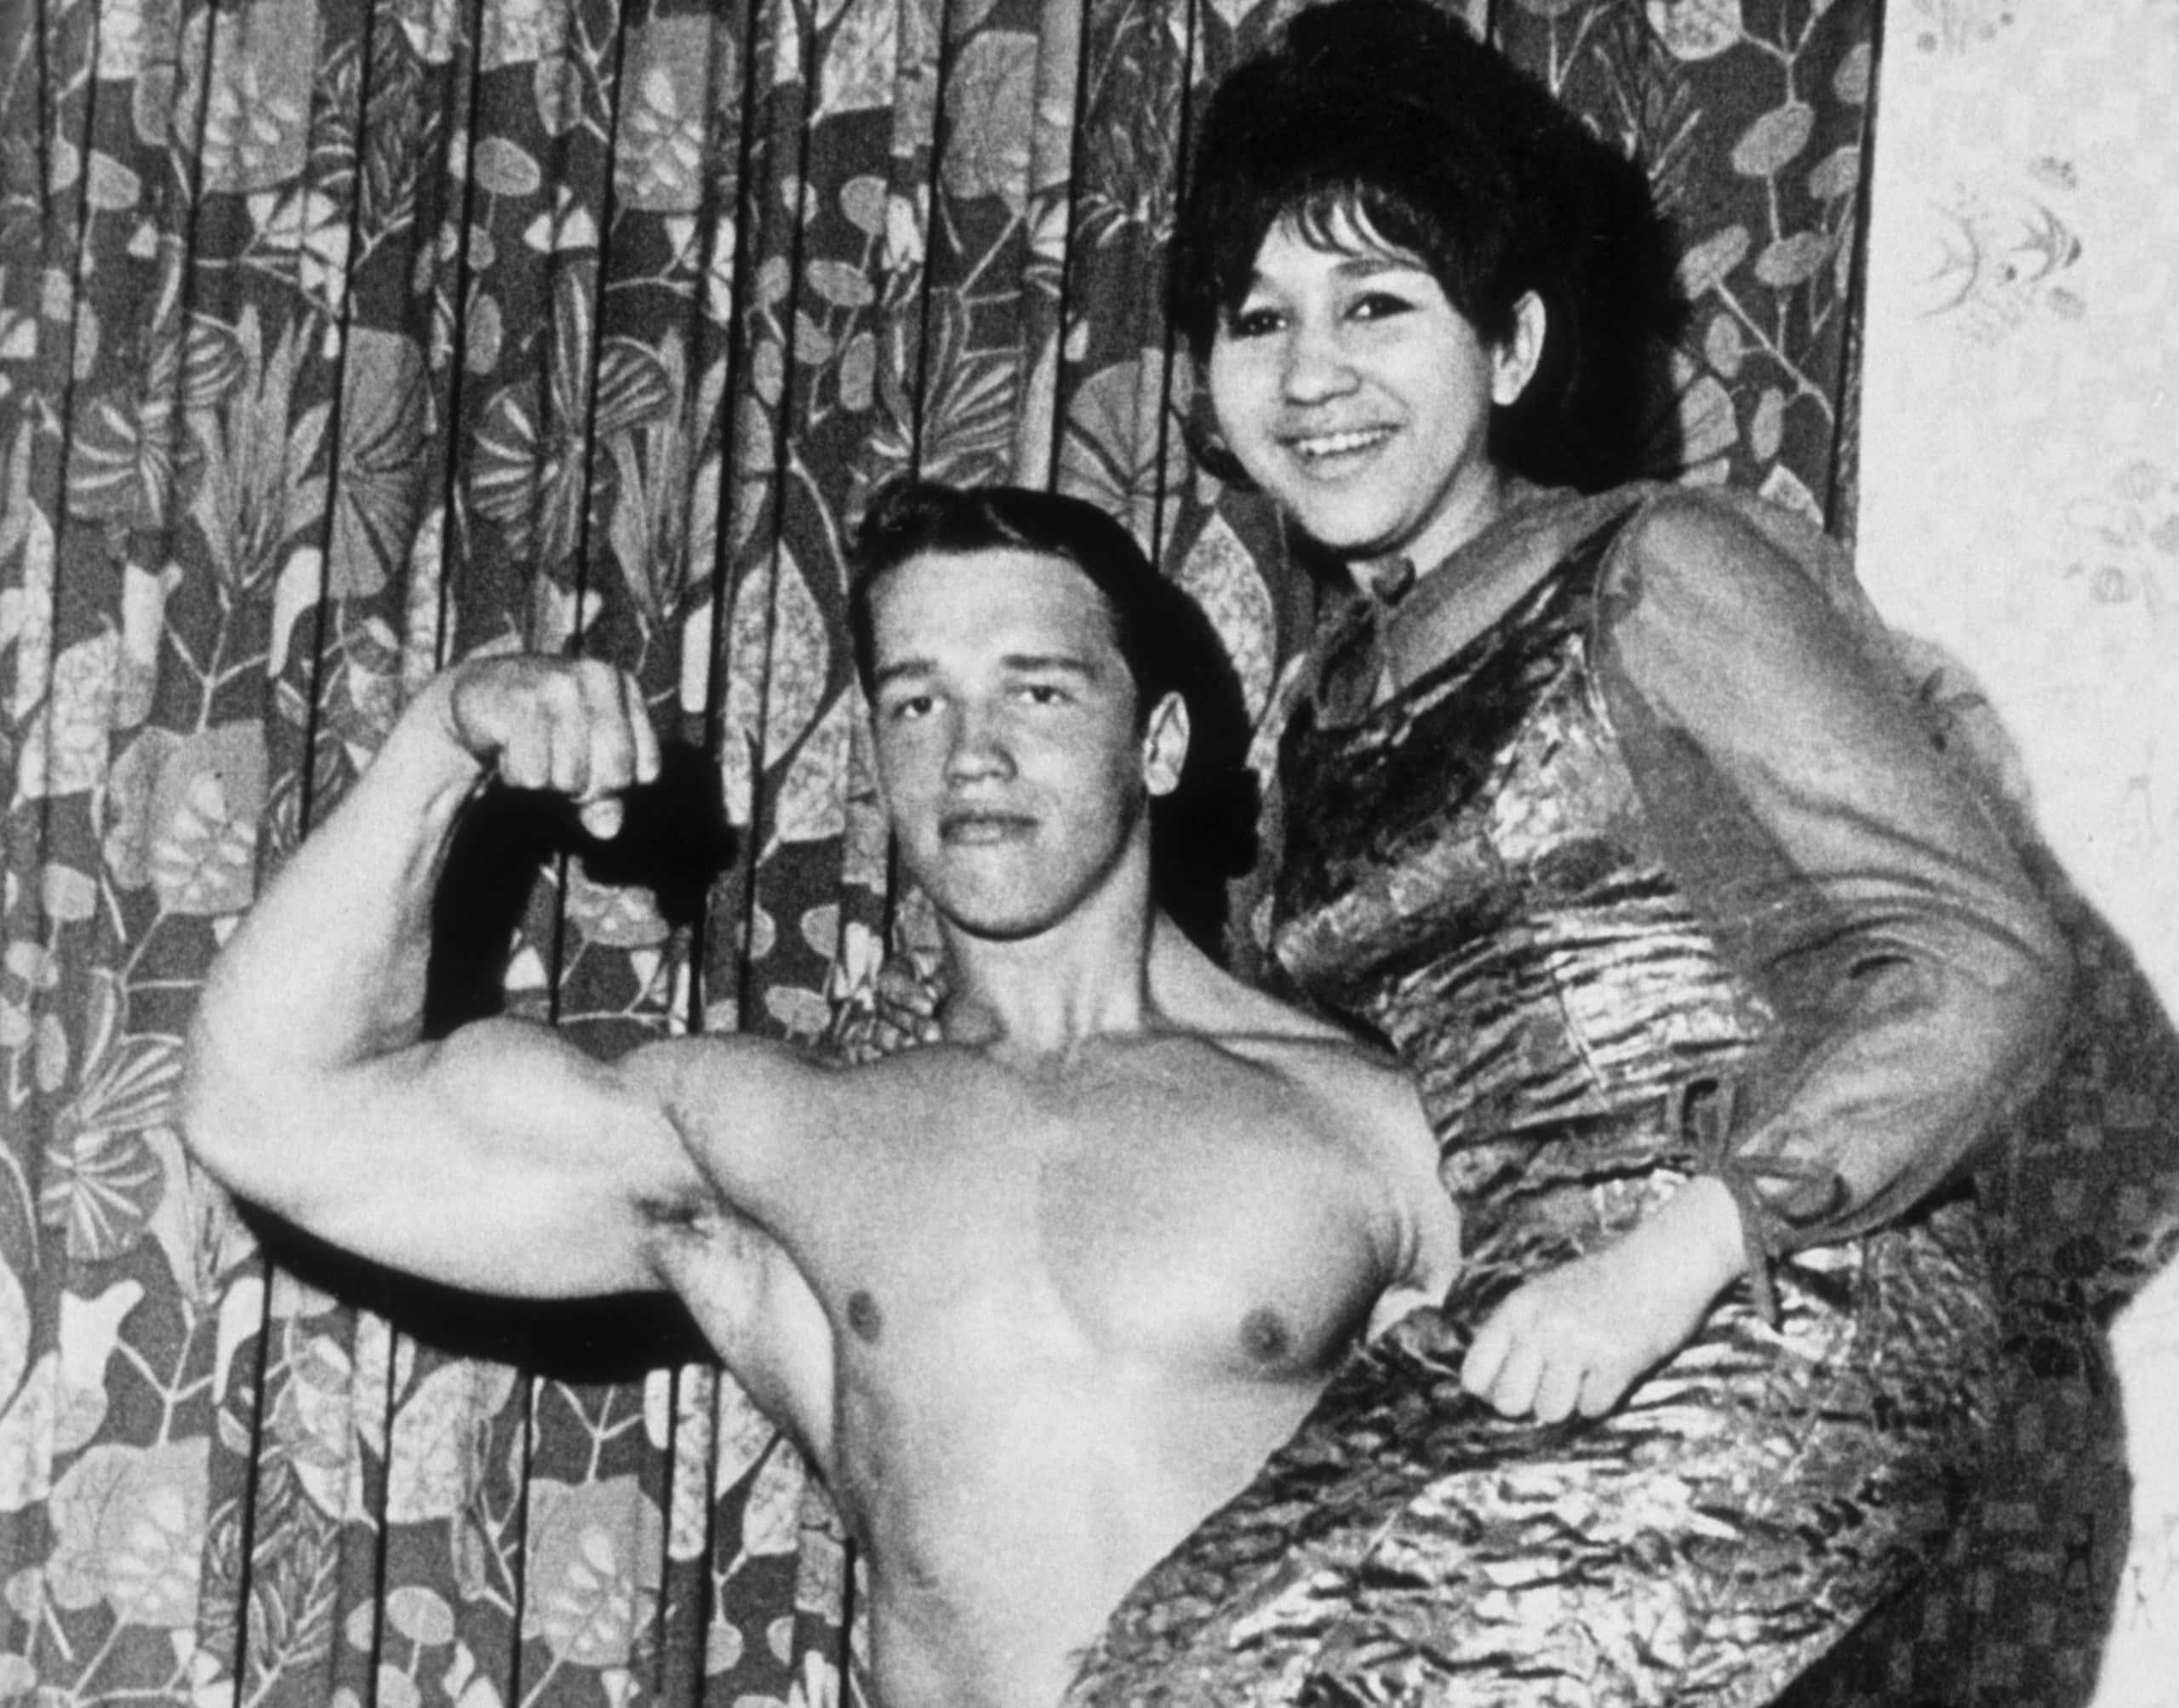 Arnold Schwarzenegger facts